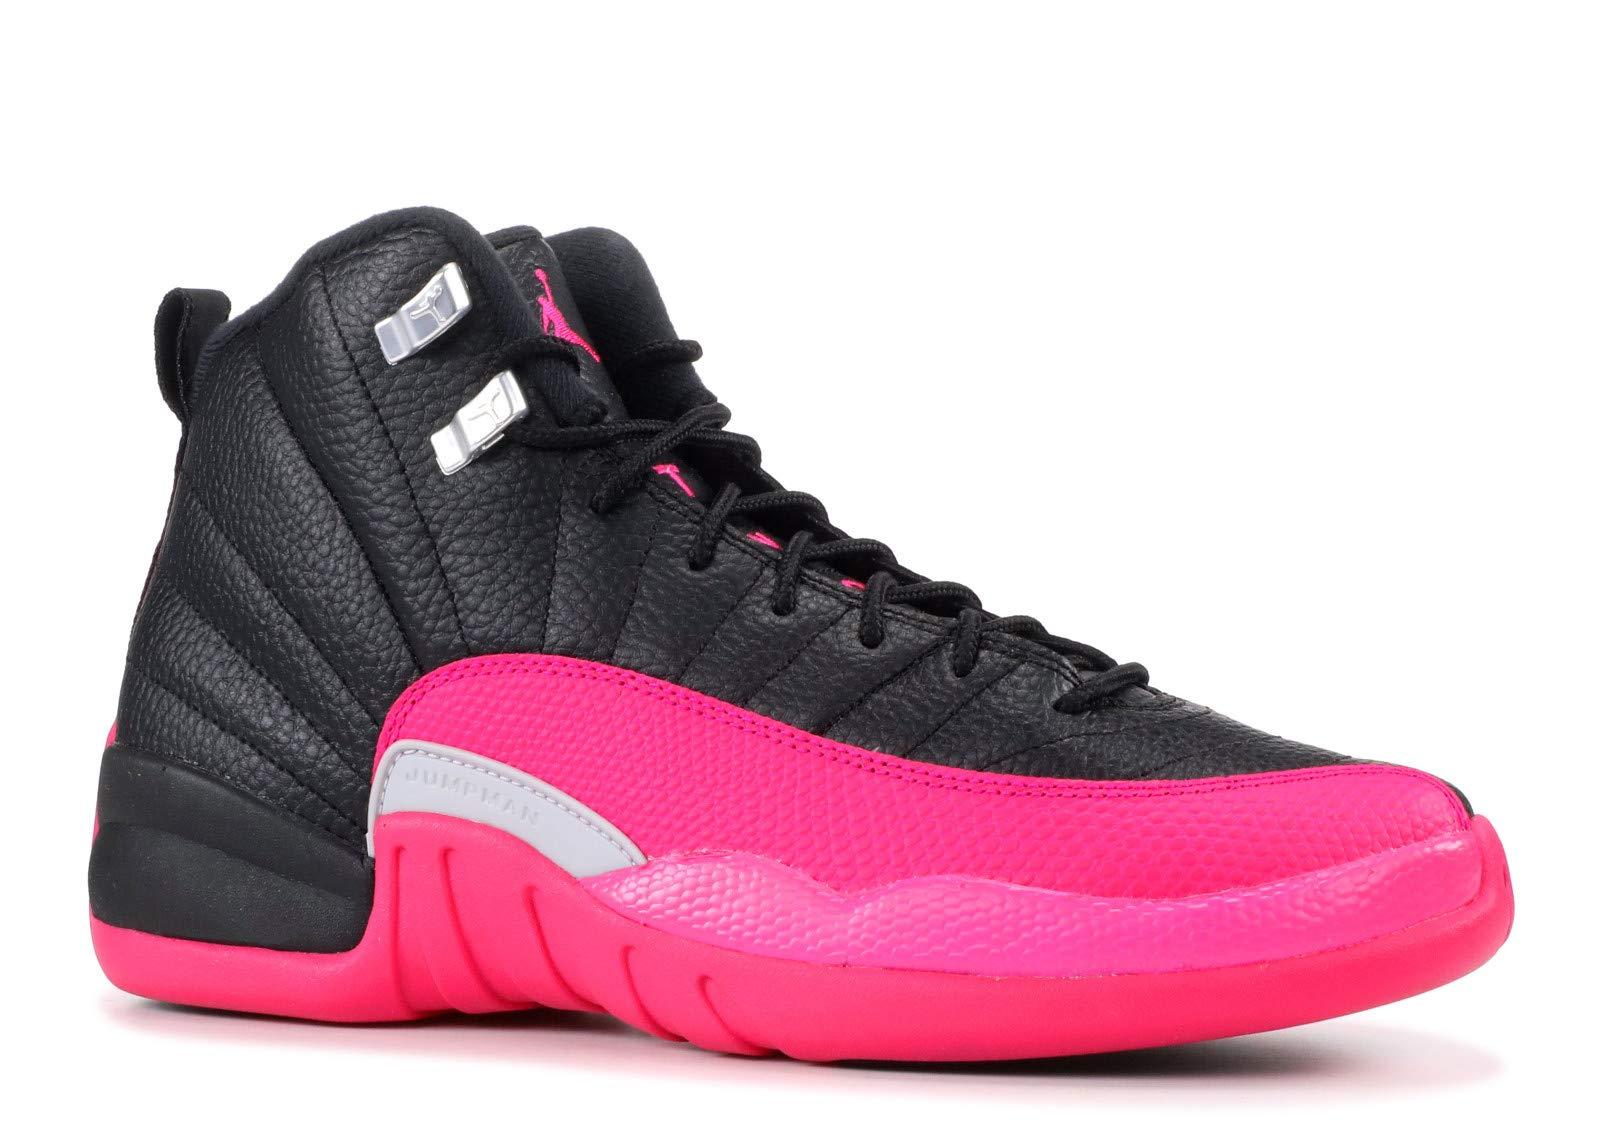 Nike Jordan Retro 12